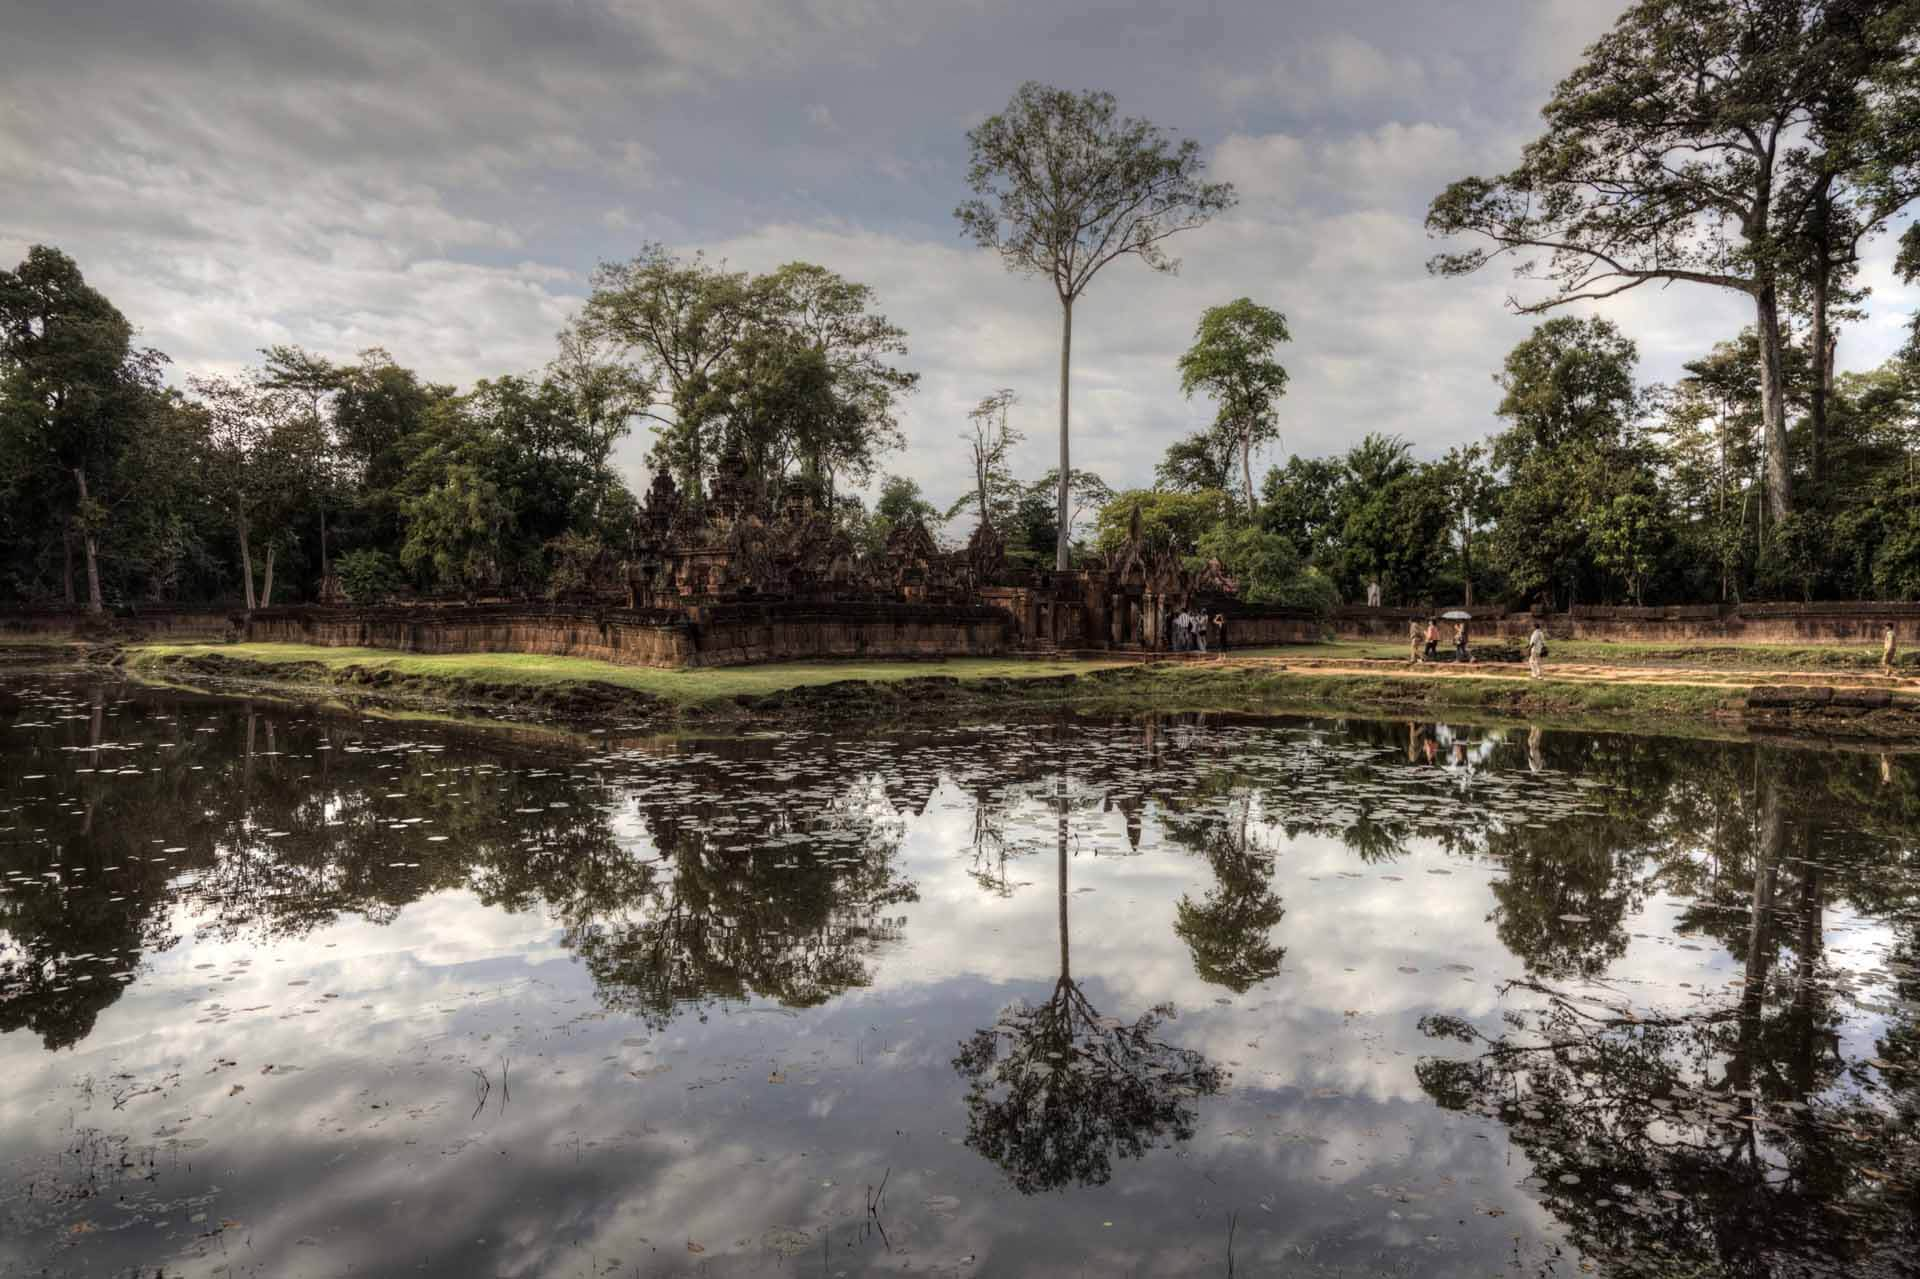 Kambodscha_Angkor_128